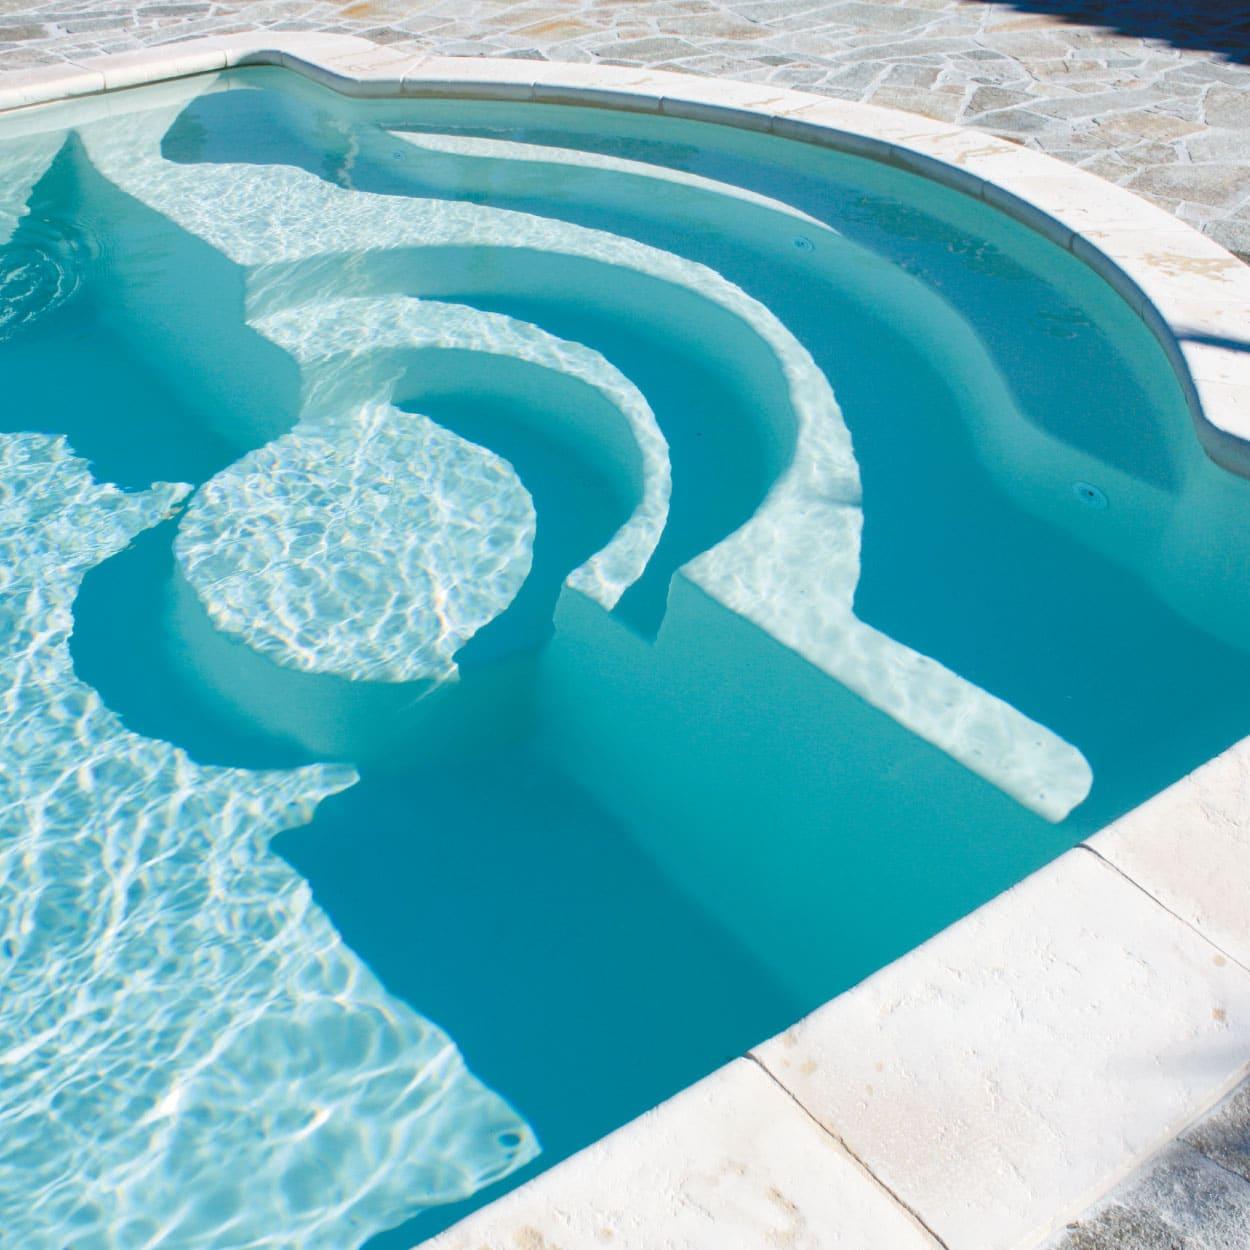 realisation-piscine-coque-porquerolles Modèle Porquerolles